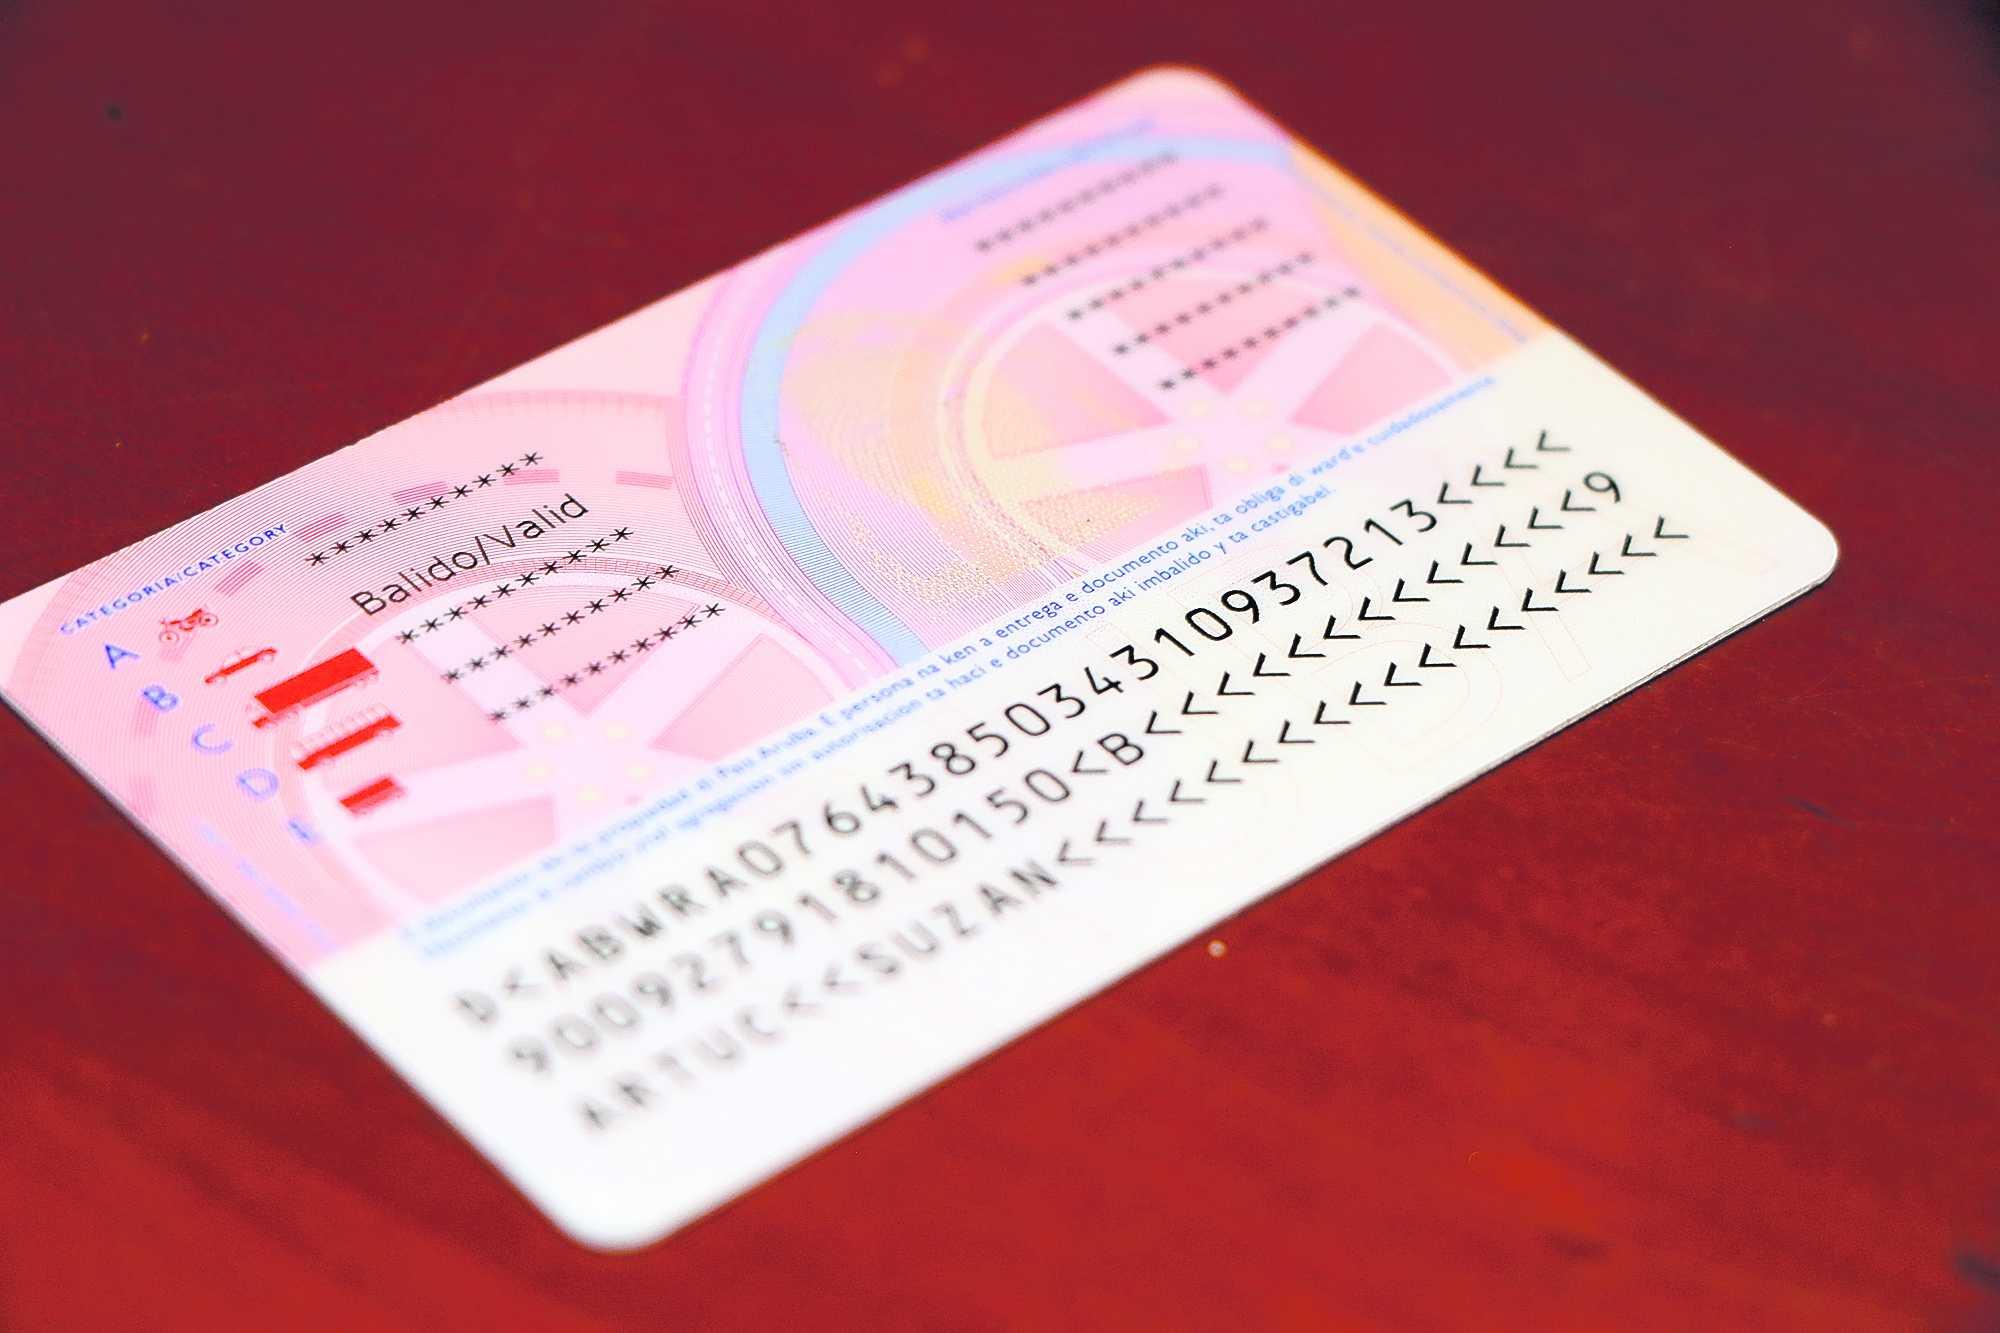 Prome Minister Evelyn Wever Croes: Unico rijbewijs cu ta keda acepta pa vota cu ne ta rijbewijs traha na Censo Aruba